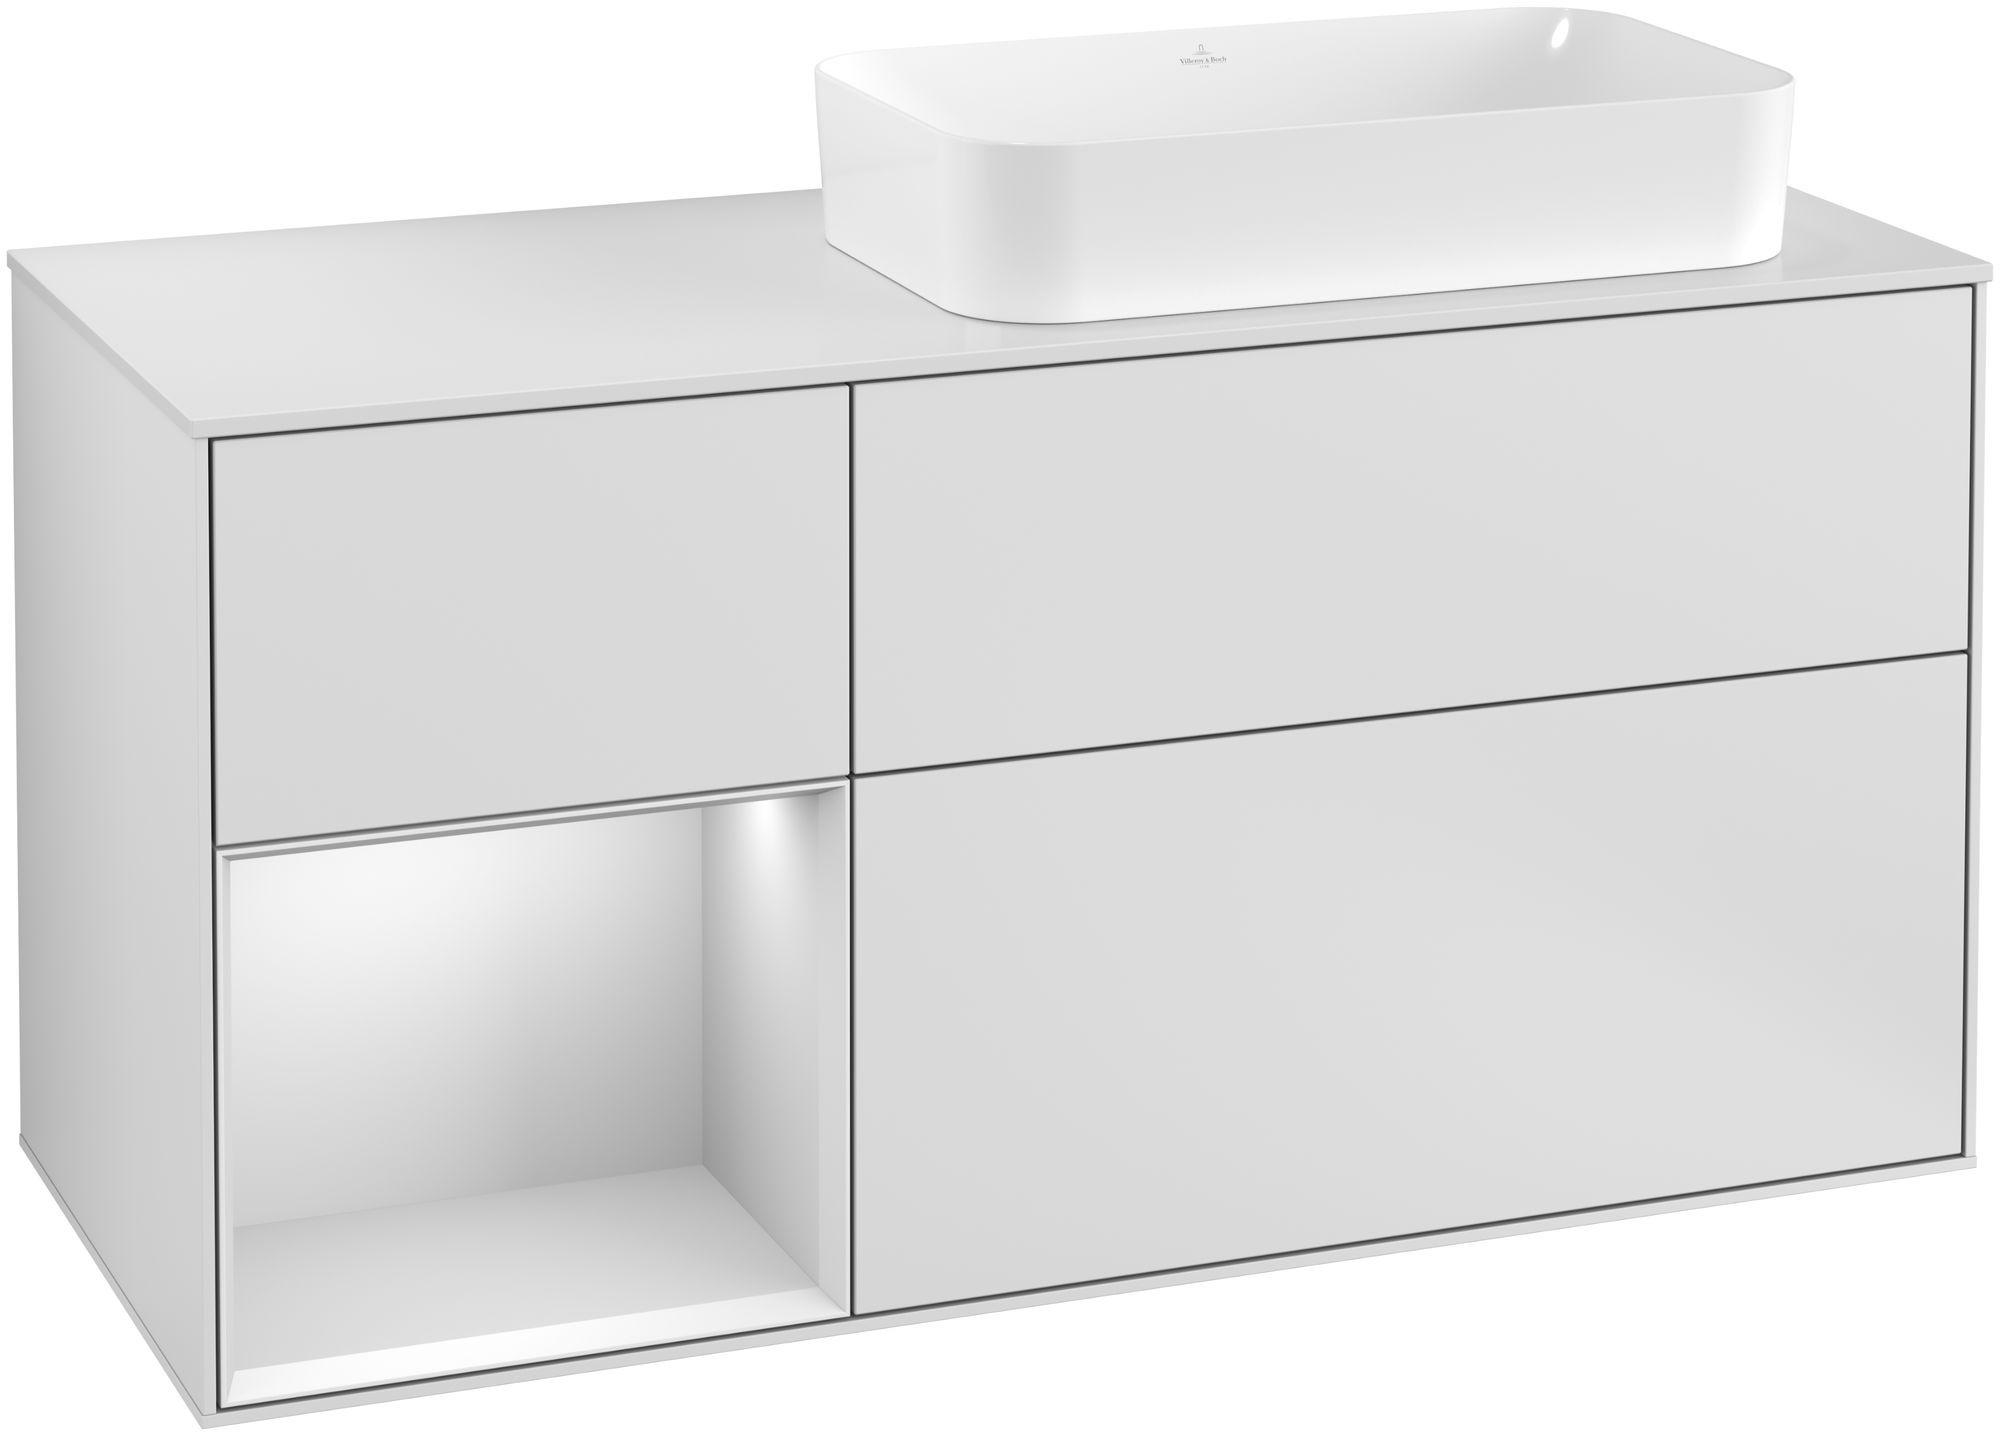 Villeroy & Boch Finion F27 Waschtischunterschrank mit Regalelement 3 Auszüge Waschtisch rechts LED-Beleuchtung B:120xH:60,3xT:50,1cm Front, Korpus: Weiß Matt Soft Grey, Glasplatte: White Matt F271MTMT